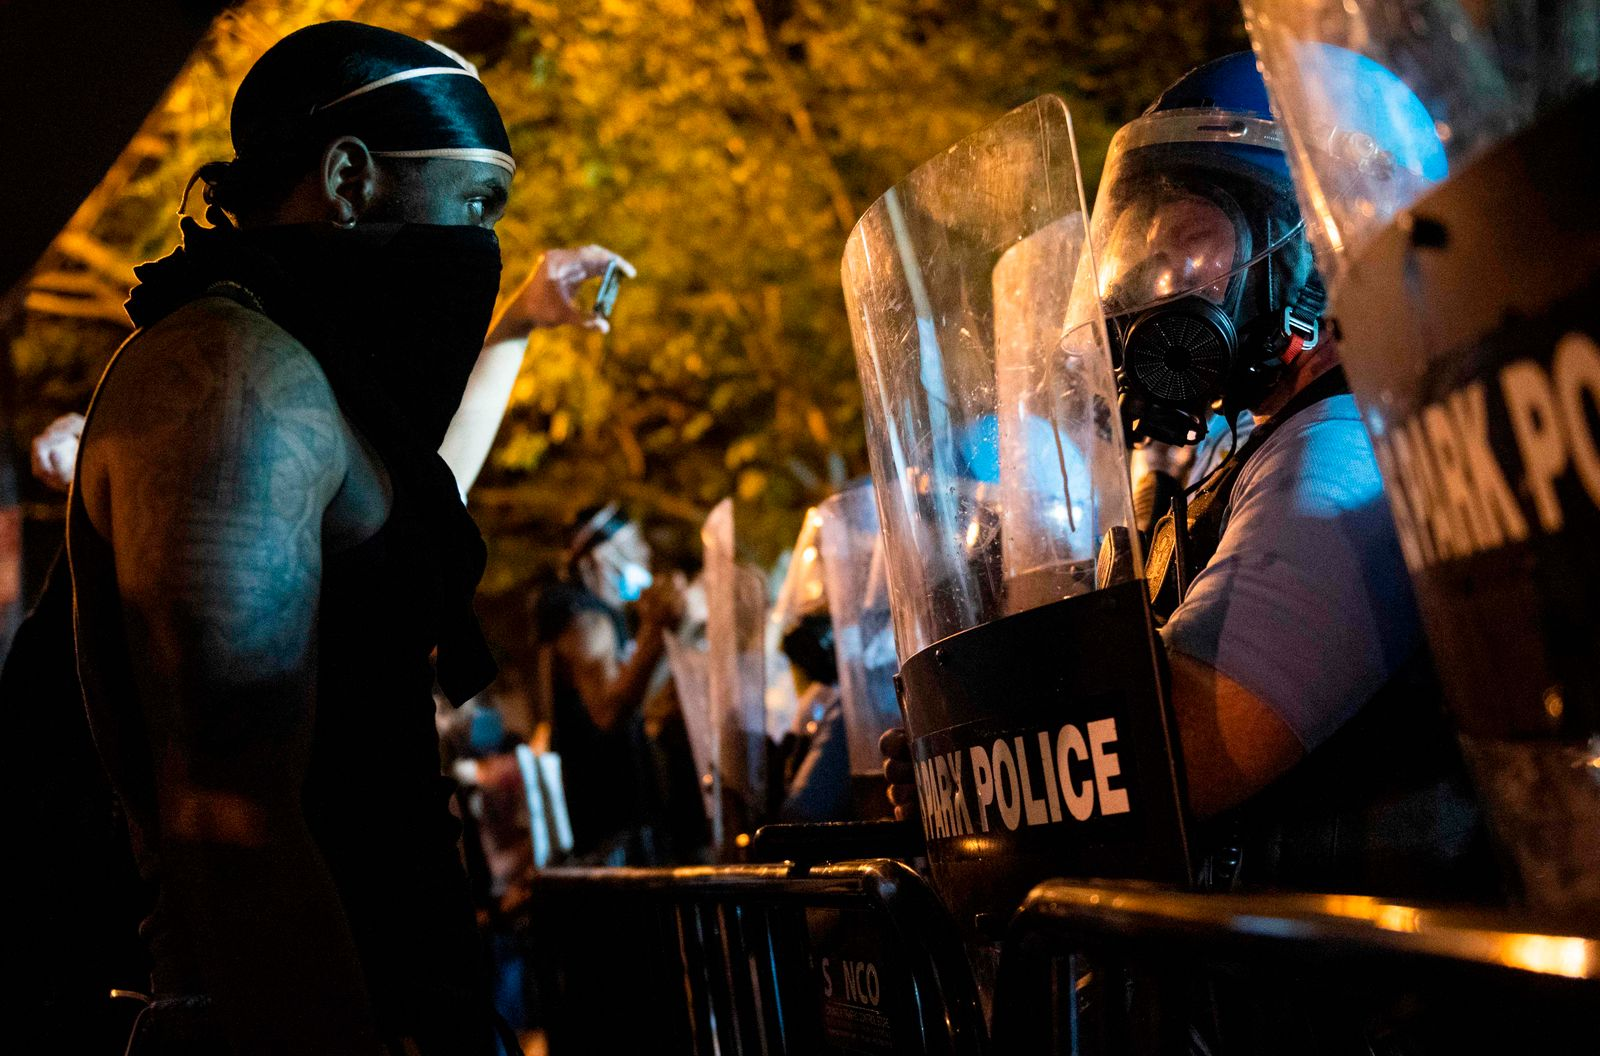 TOPSHOT-US-POLITICS-RACISM-JUSTICE-police-minorities